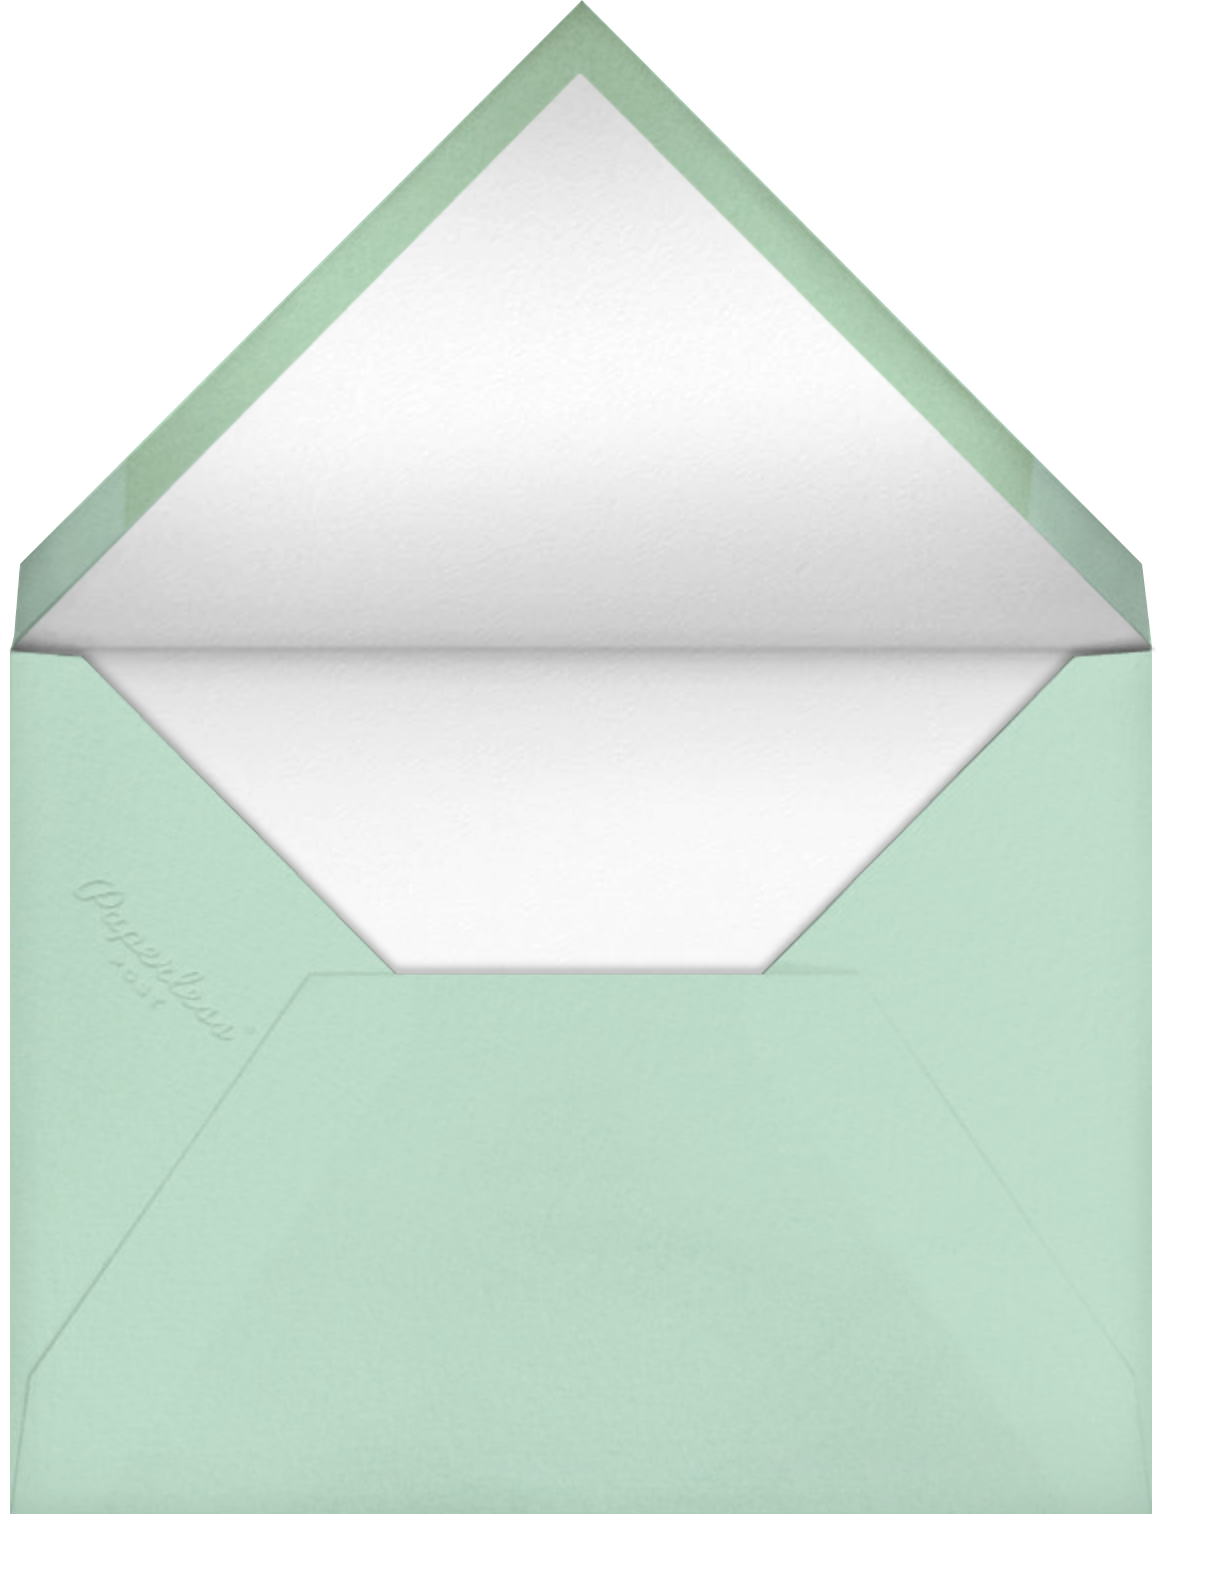 Boogie Down - Paperless Post - null - envelope back